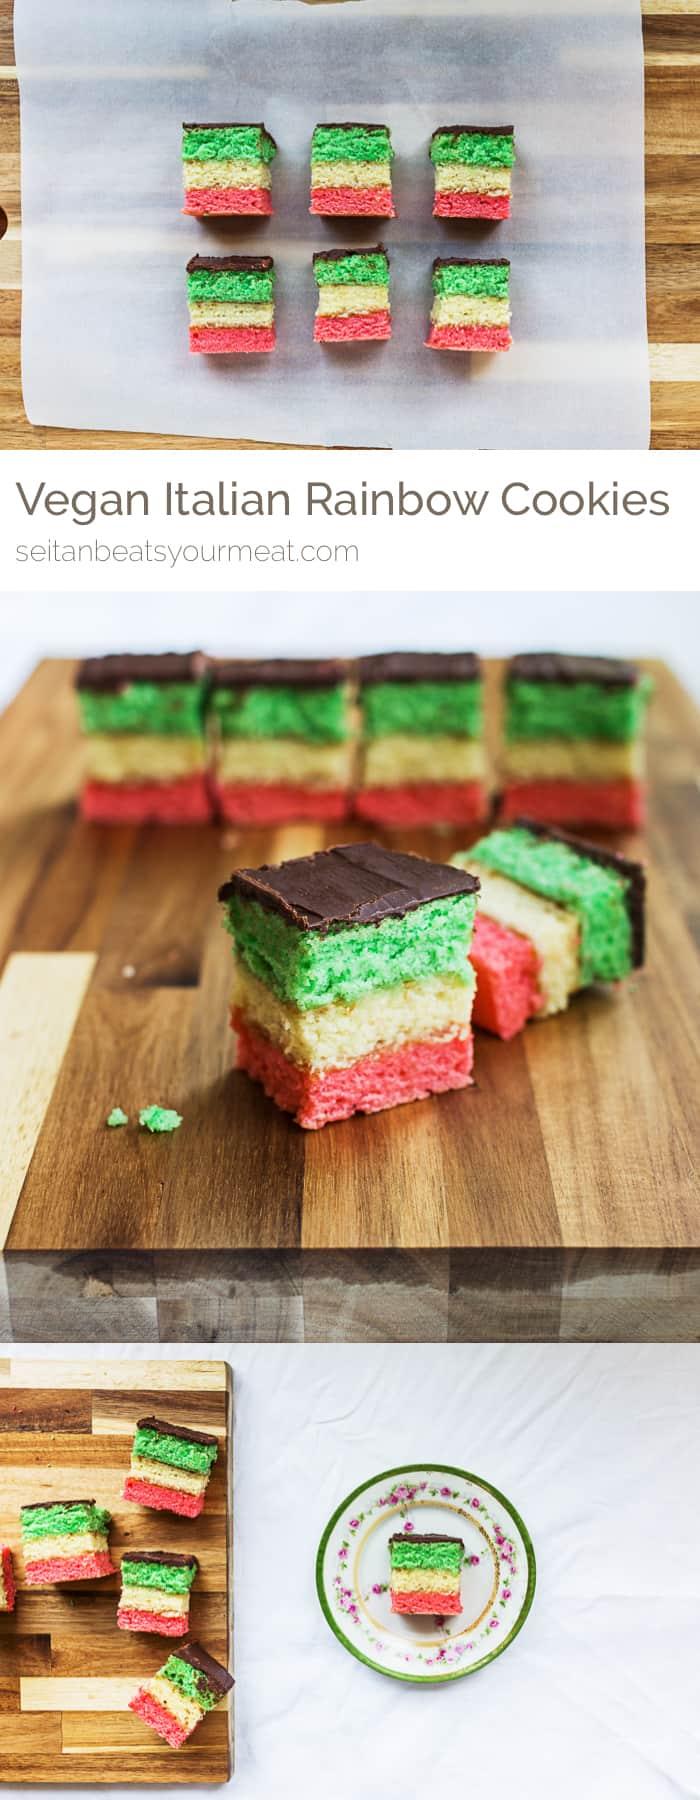 Vegan Italian Rainbow Cookies recipe